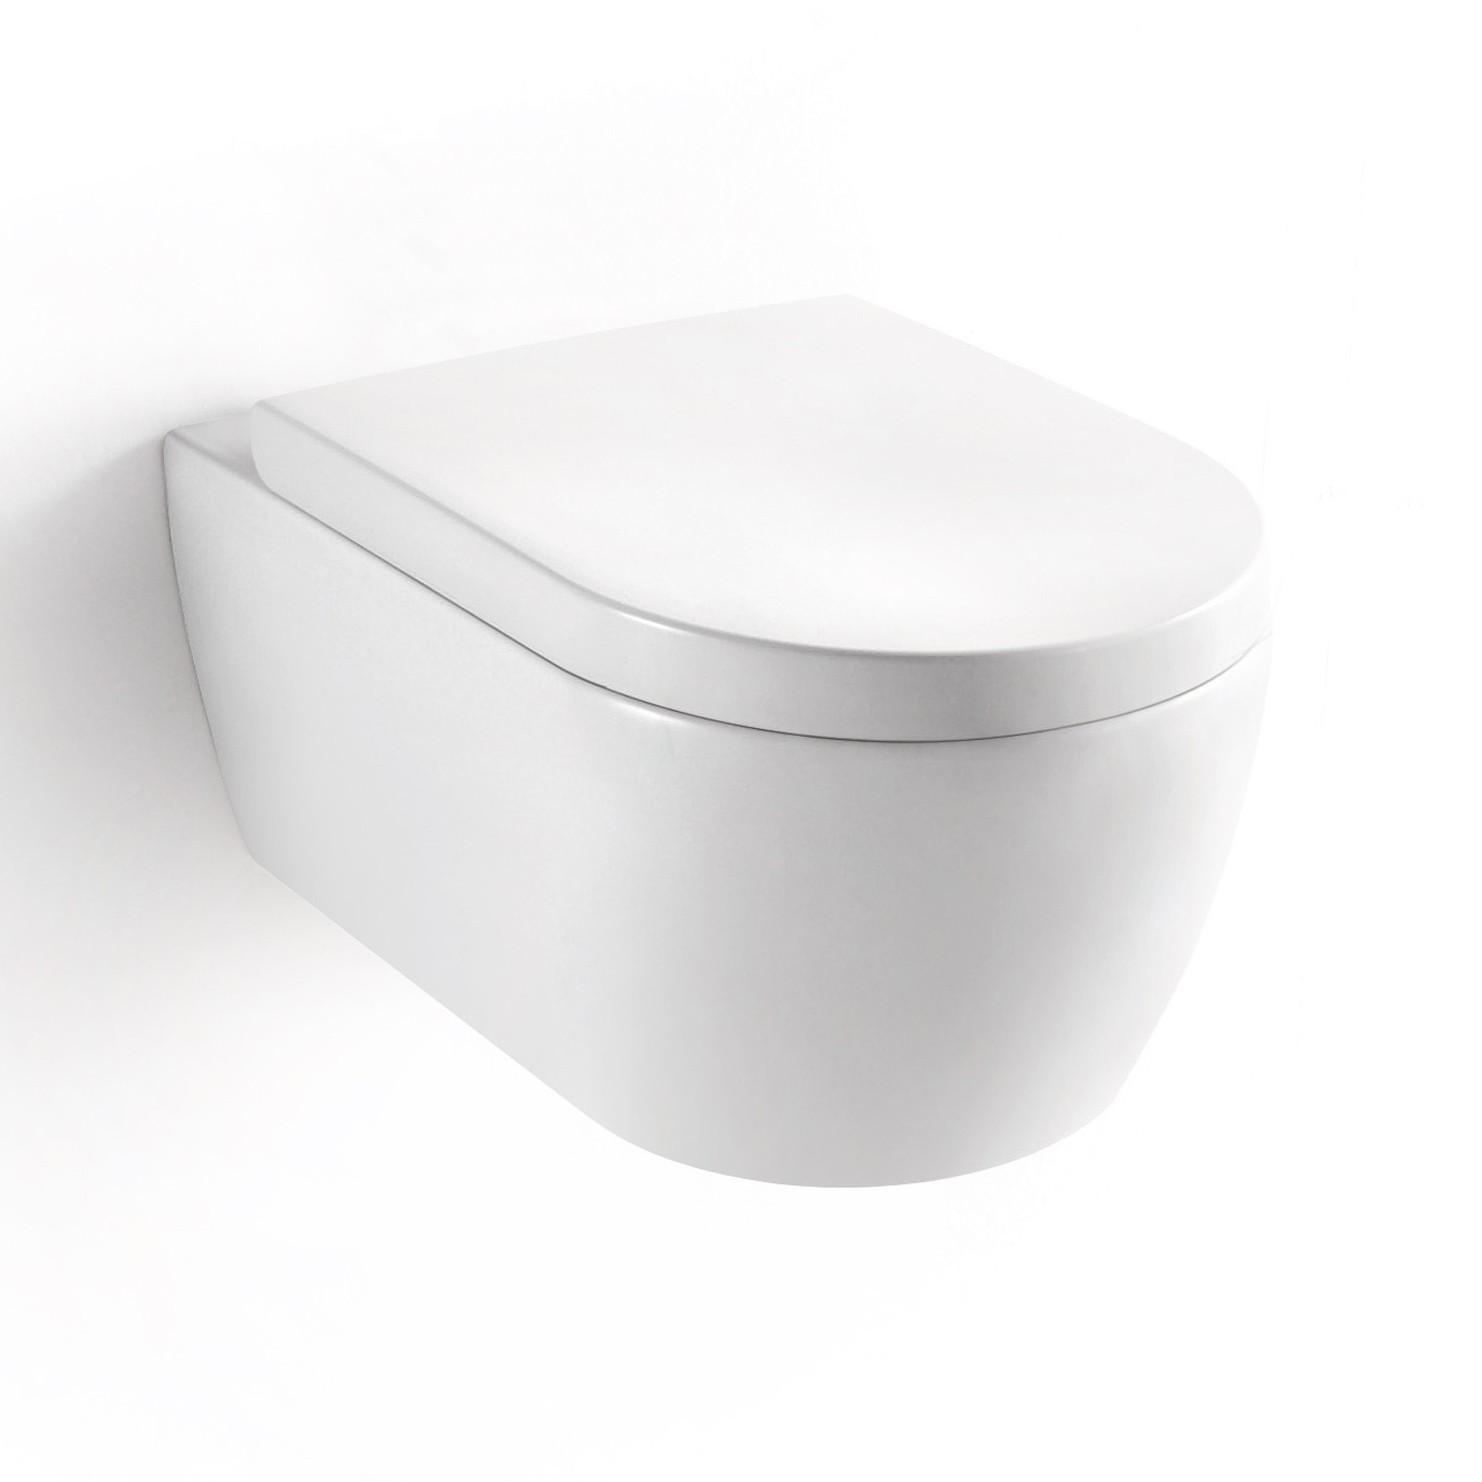 soho h nge wand wc ohne untersp lrand toilette brillant weiss mit wc sitz badkeramik wc keramik. Black Bedroom Furniture Sets. Home Design Ideas